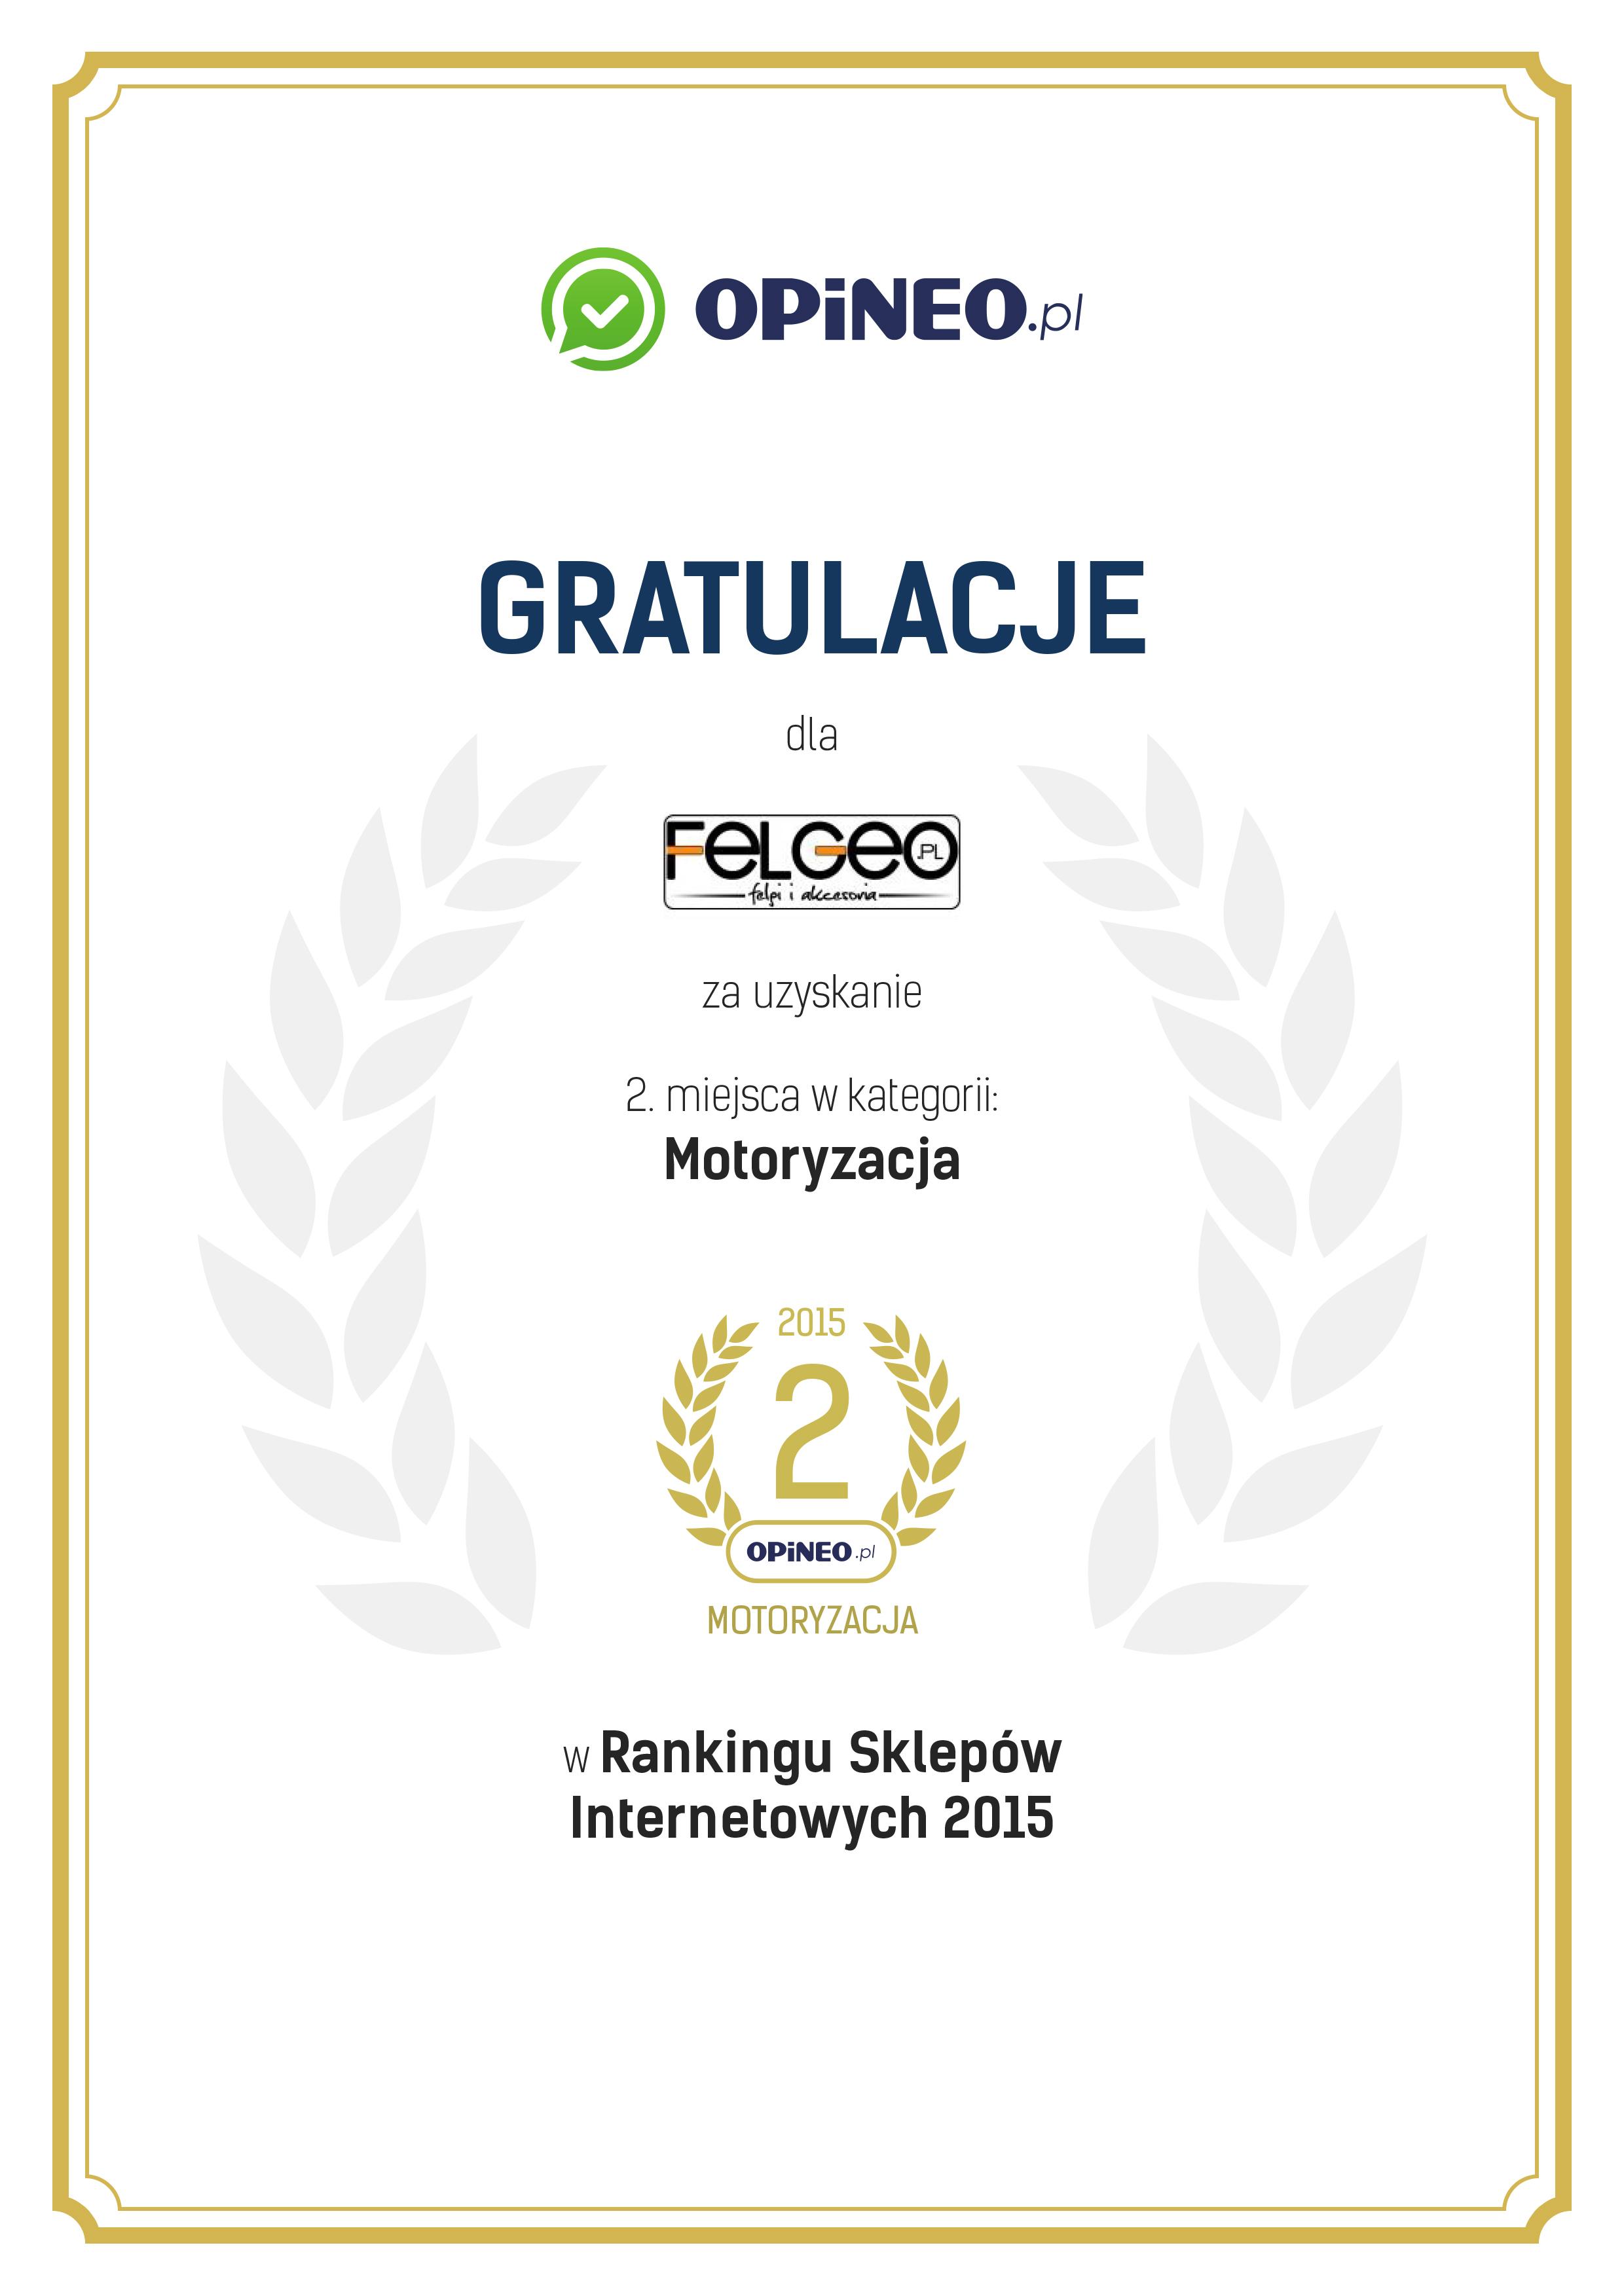 Nagroda 2 miejsce Opineo.pl